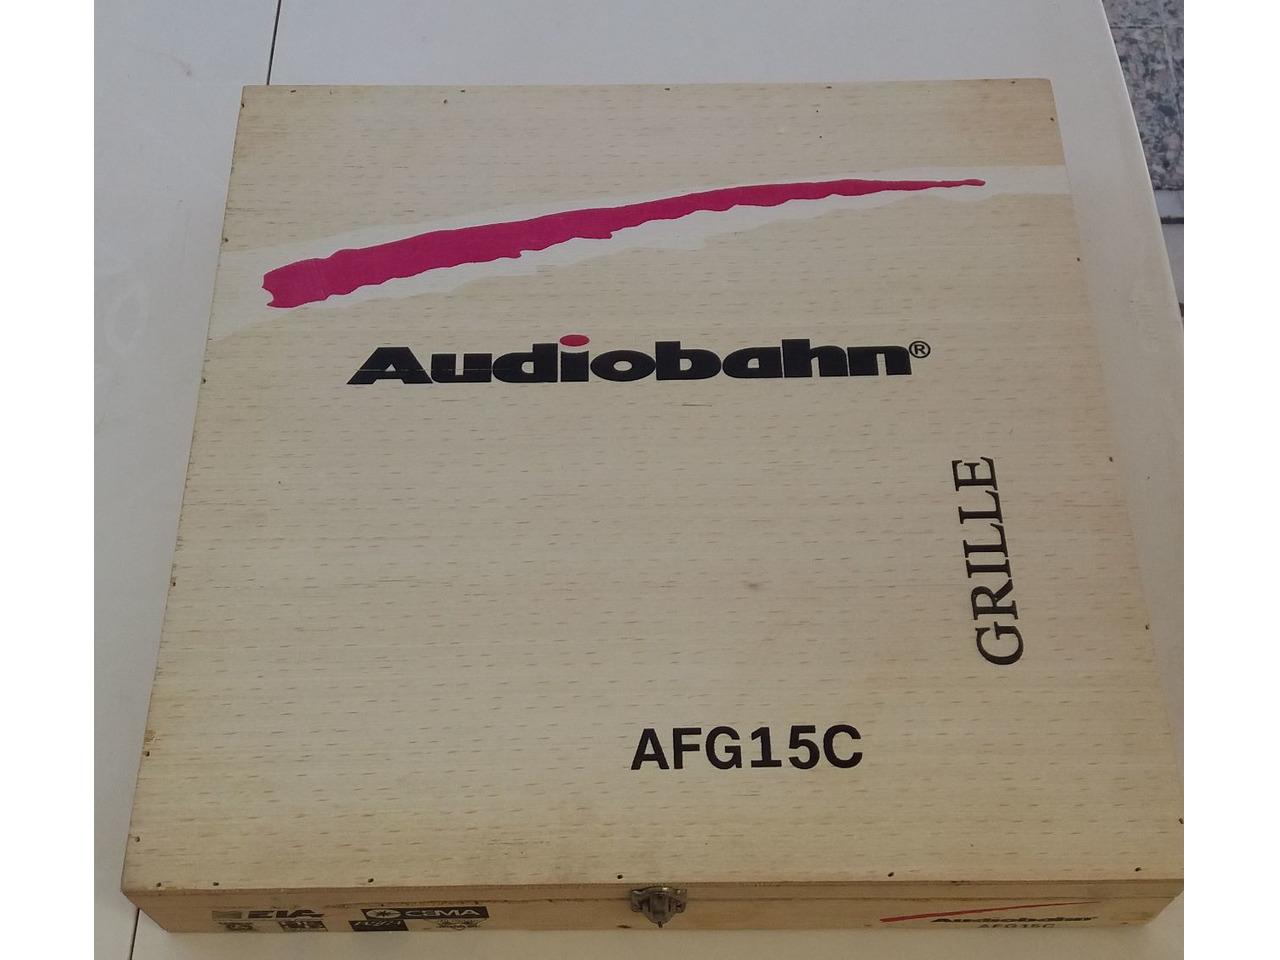 "AFG15C - Grelha para subwoofer de 15"", Audiobahn - 3/3"